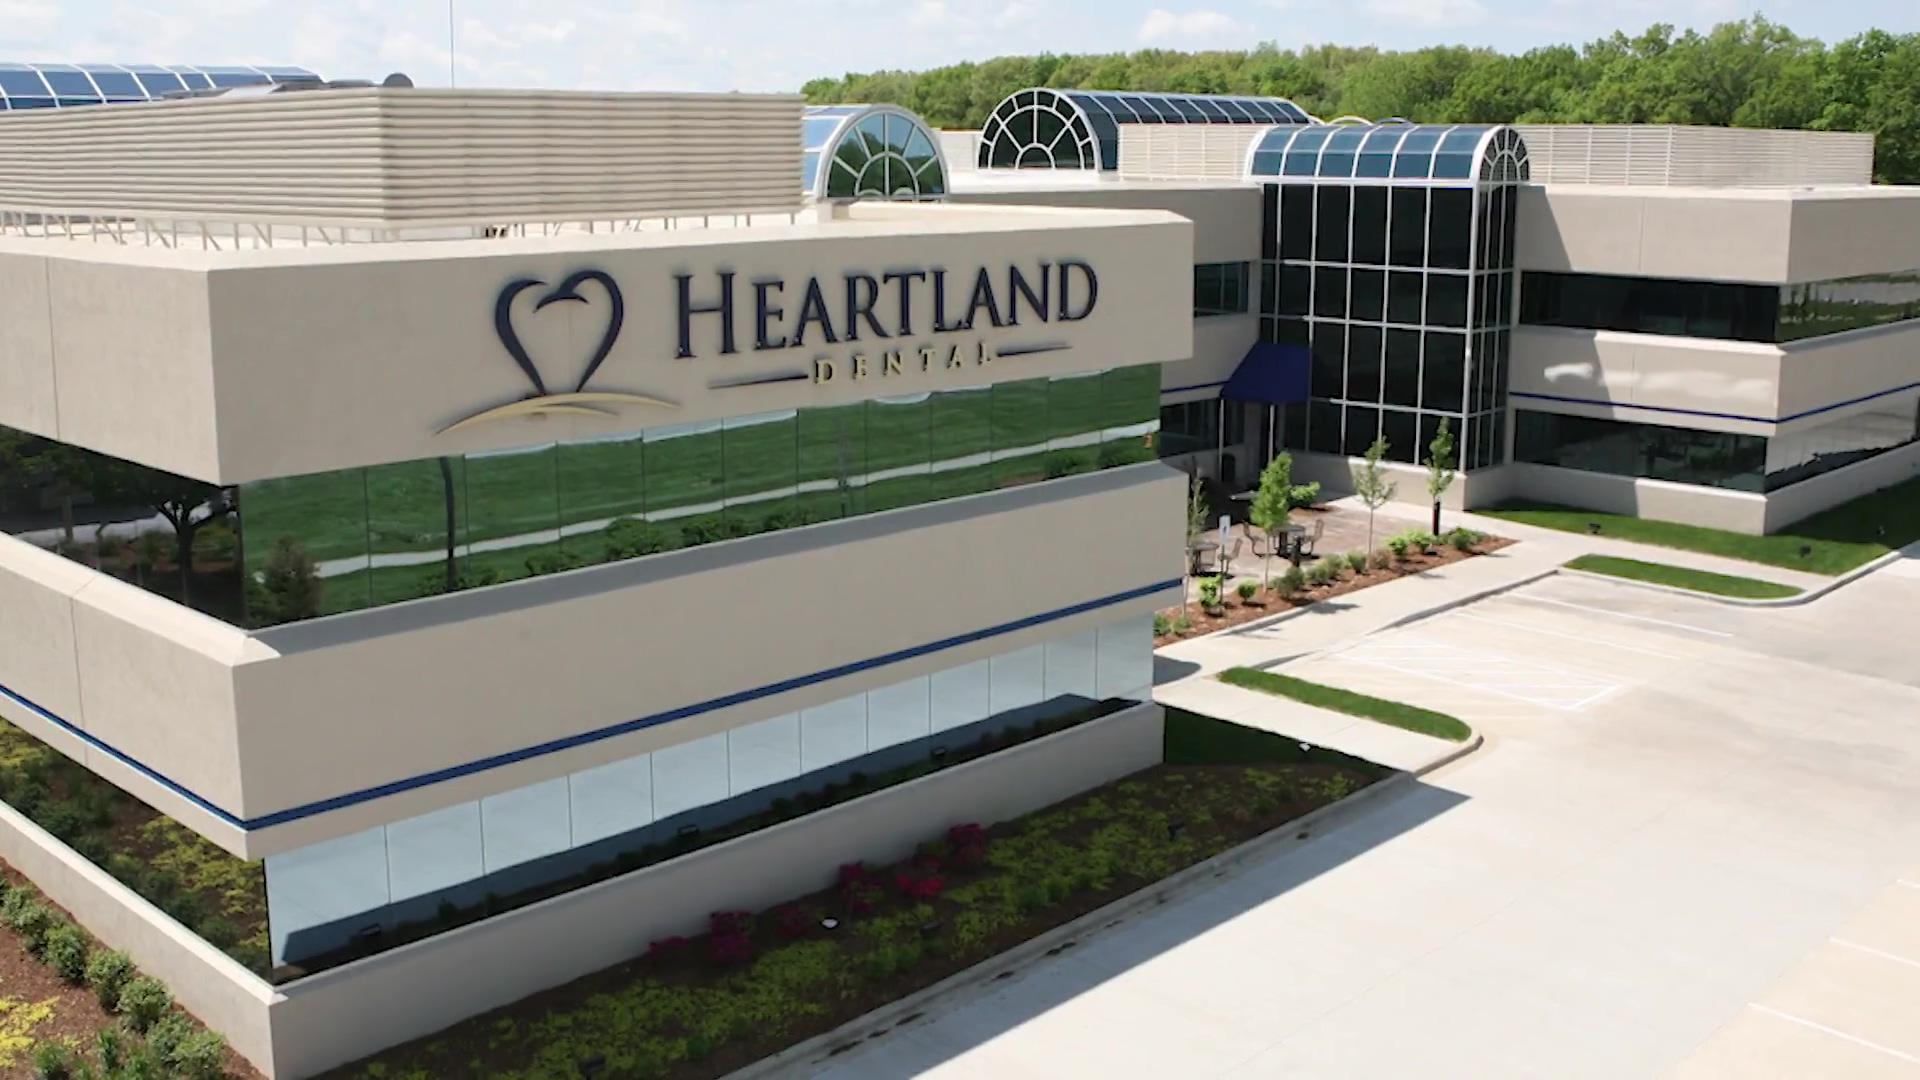 Heartland Video